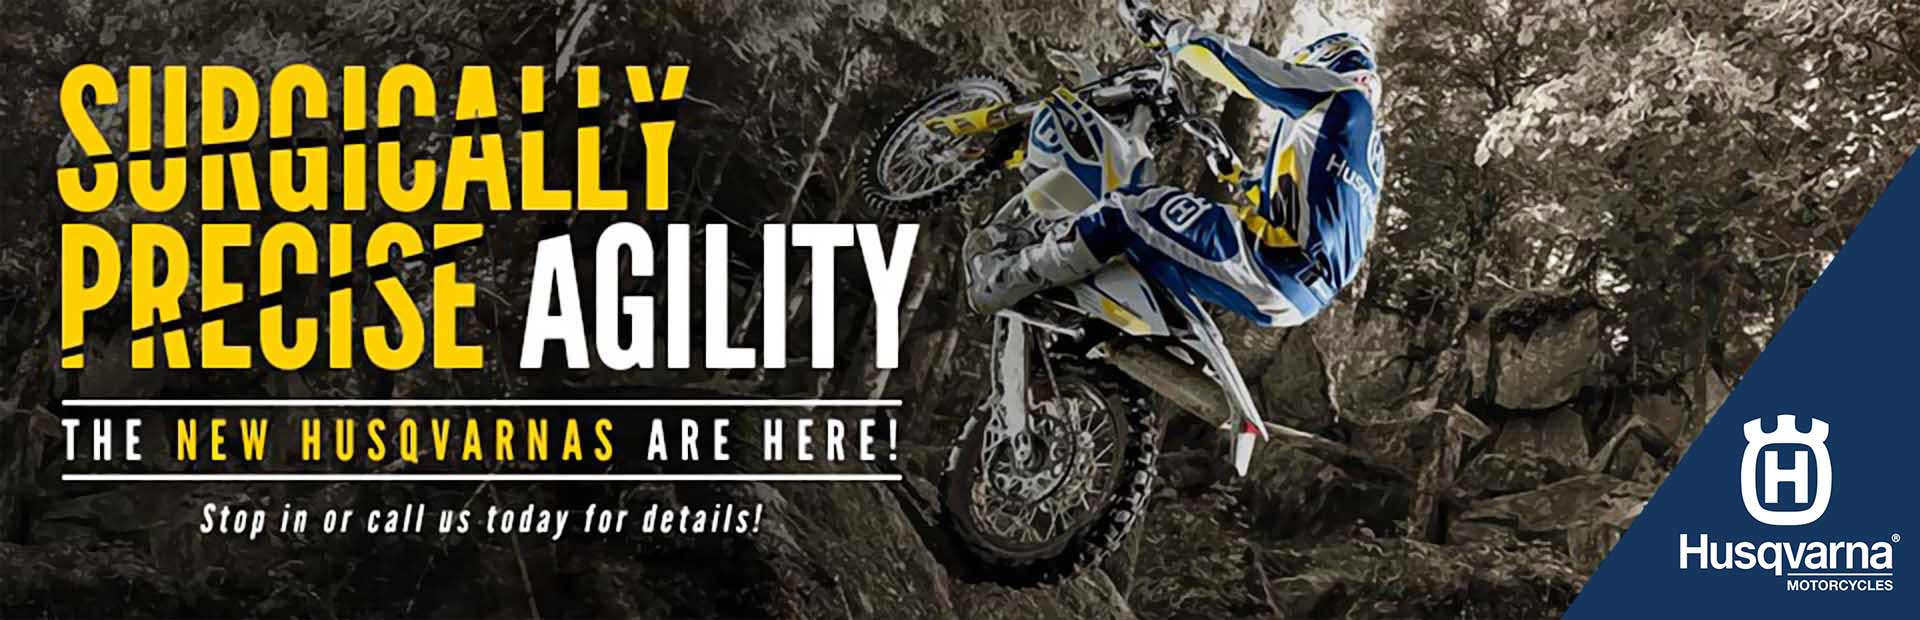 Click here to view the new Husqvarna dirt bikes.